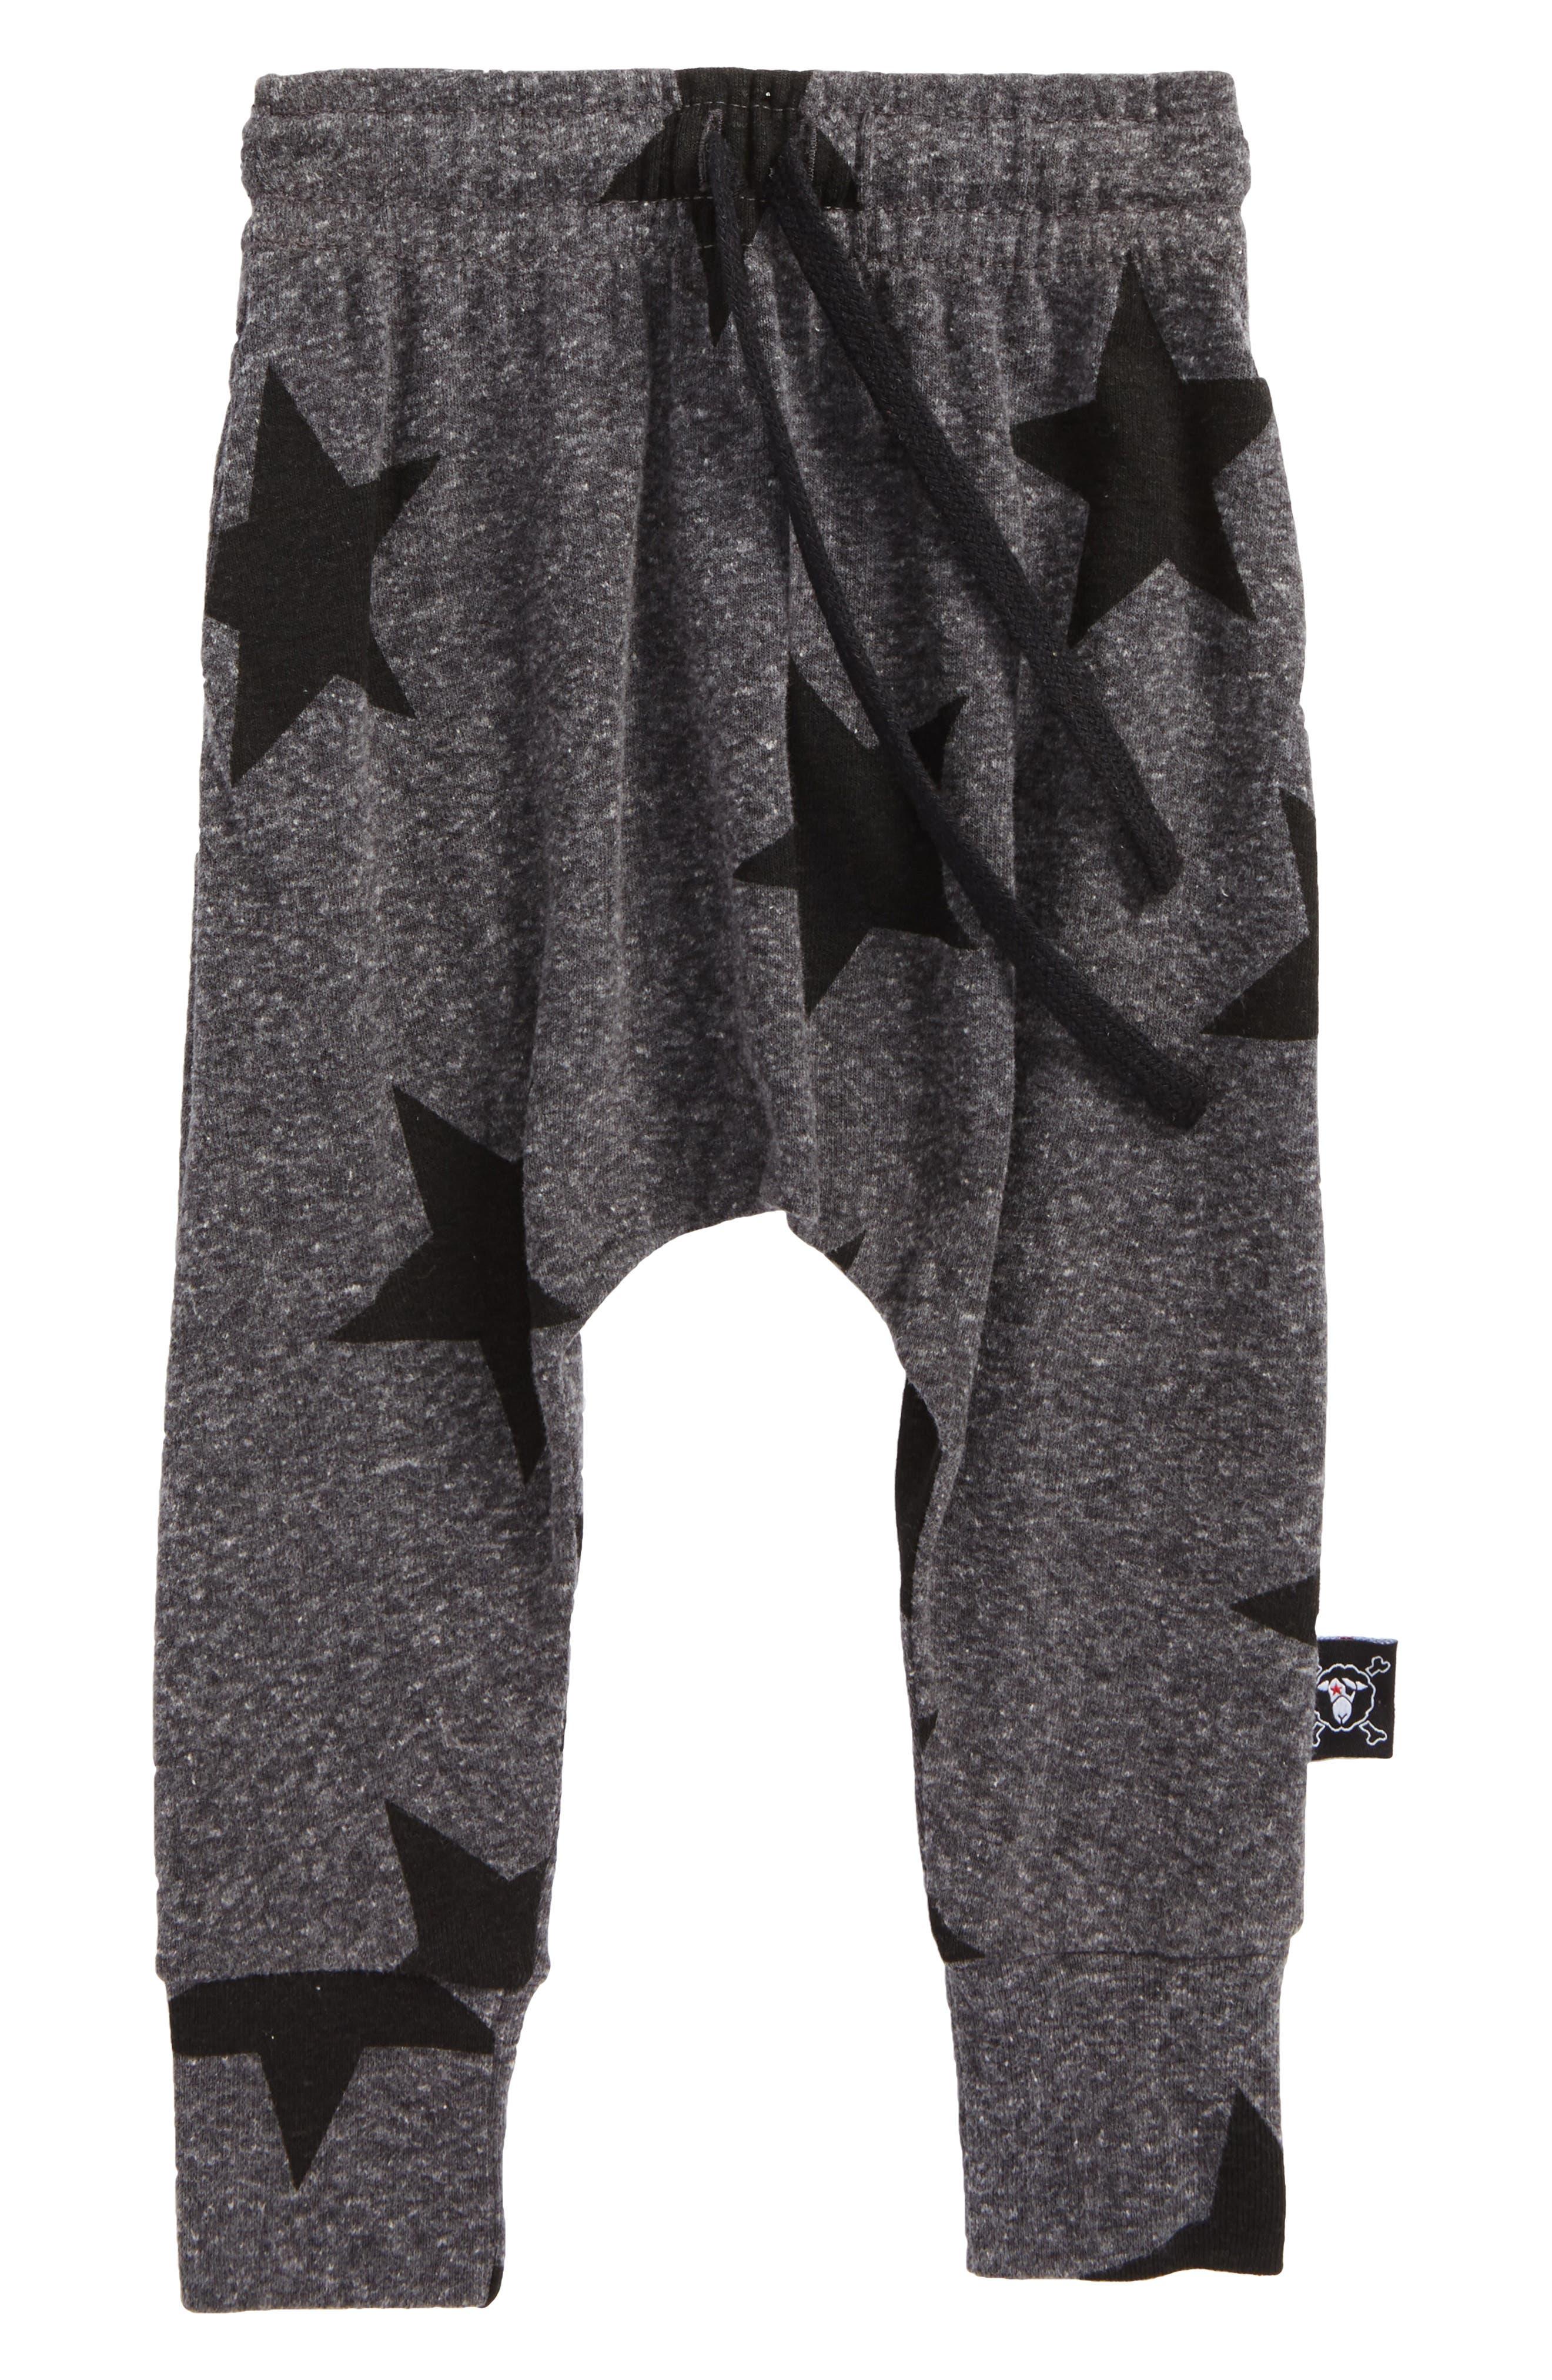 Alternate Image 1 Selected - Nununu Star Print Baggy Pants (Baby)